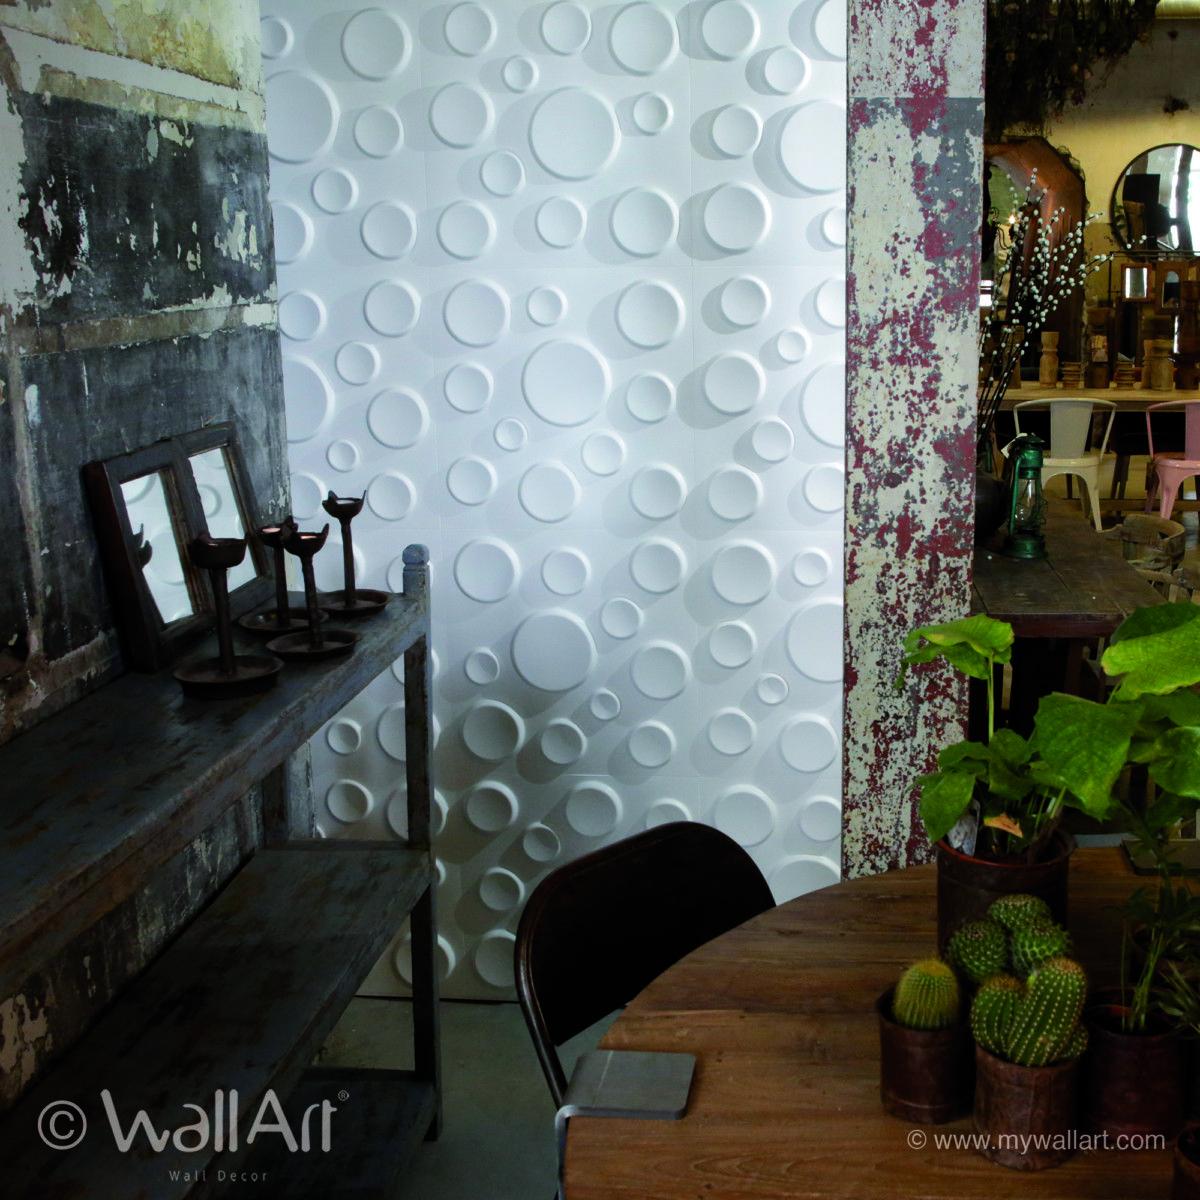 Accent Wall Ideas Wood Wall Ideas Decorative Wall Panels Gallery 3d Wall Panels Decorative Wall Panels Wall Paneling Diy